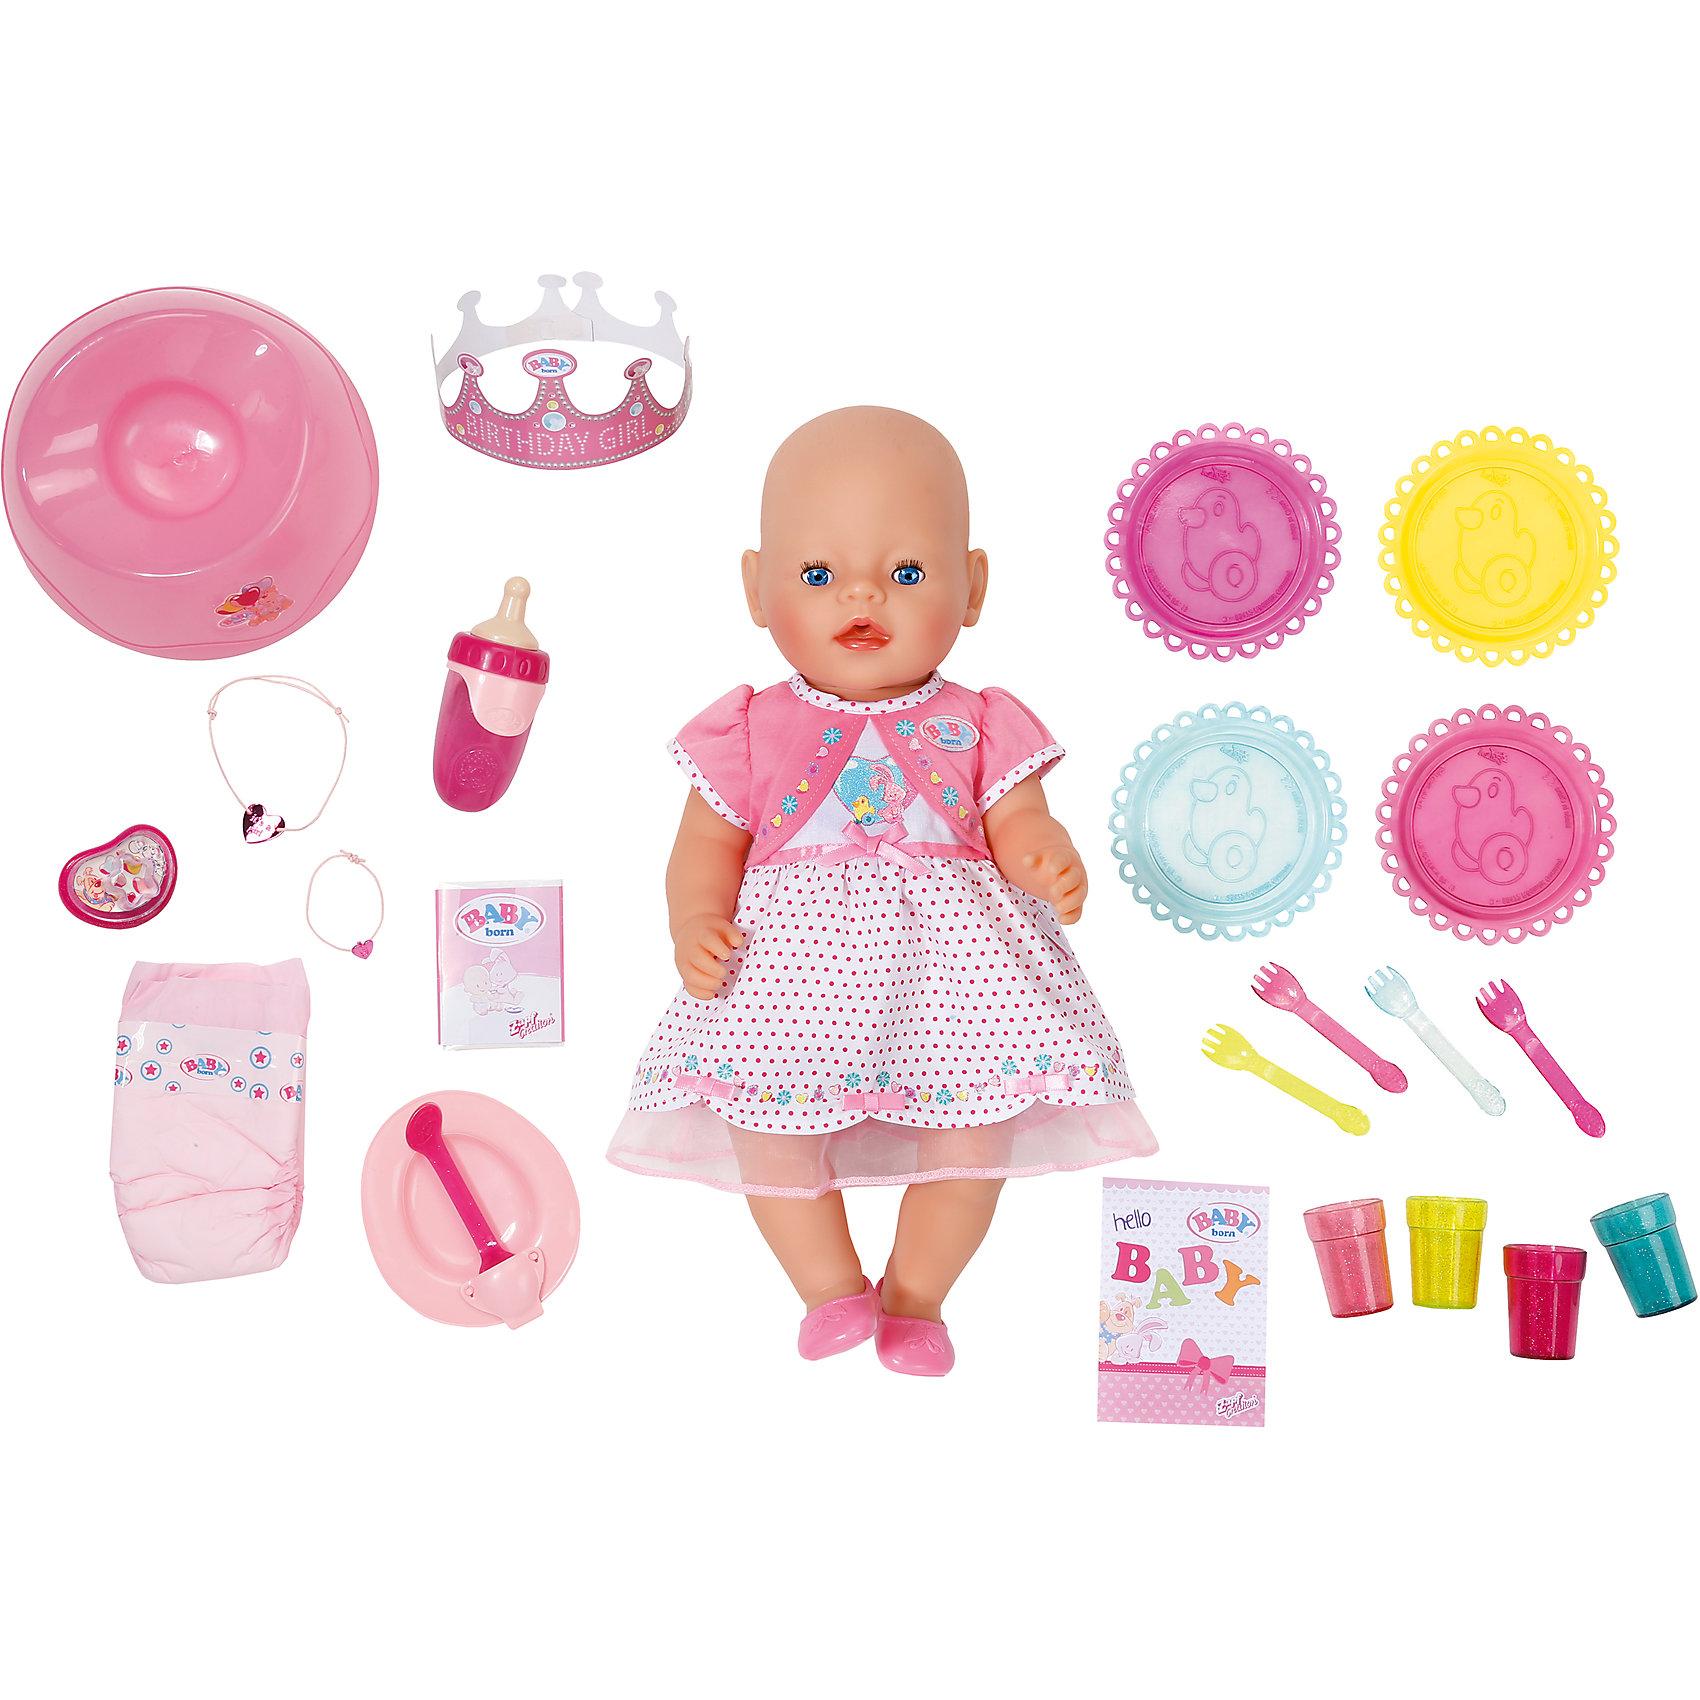 Zapf Creation Интерактивная кукла Праздничная, 43 см, BABY born кукла zapf creation baby born сестричка 43 см